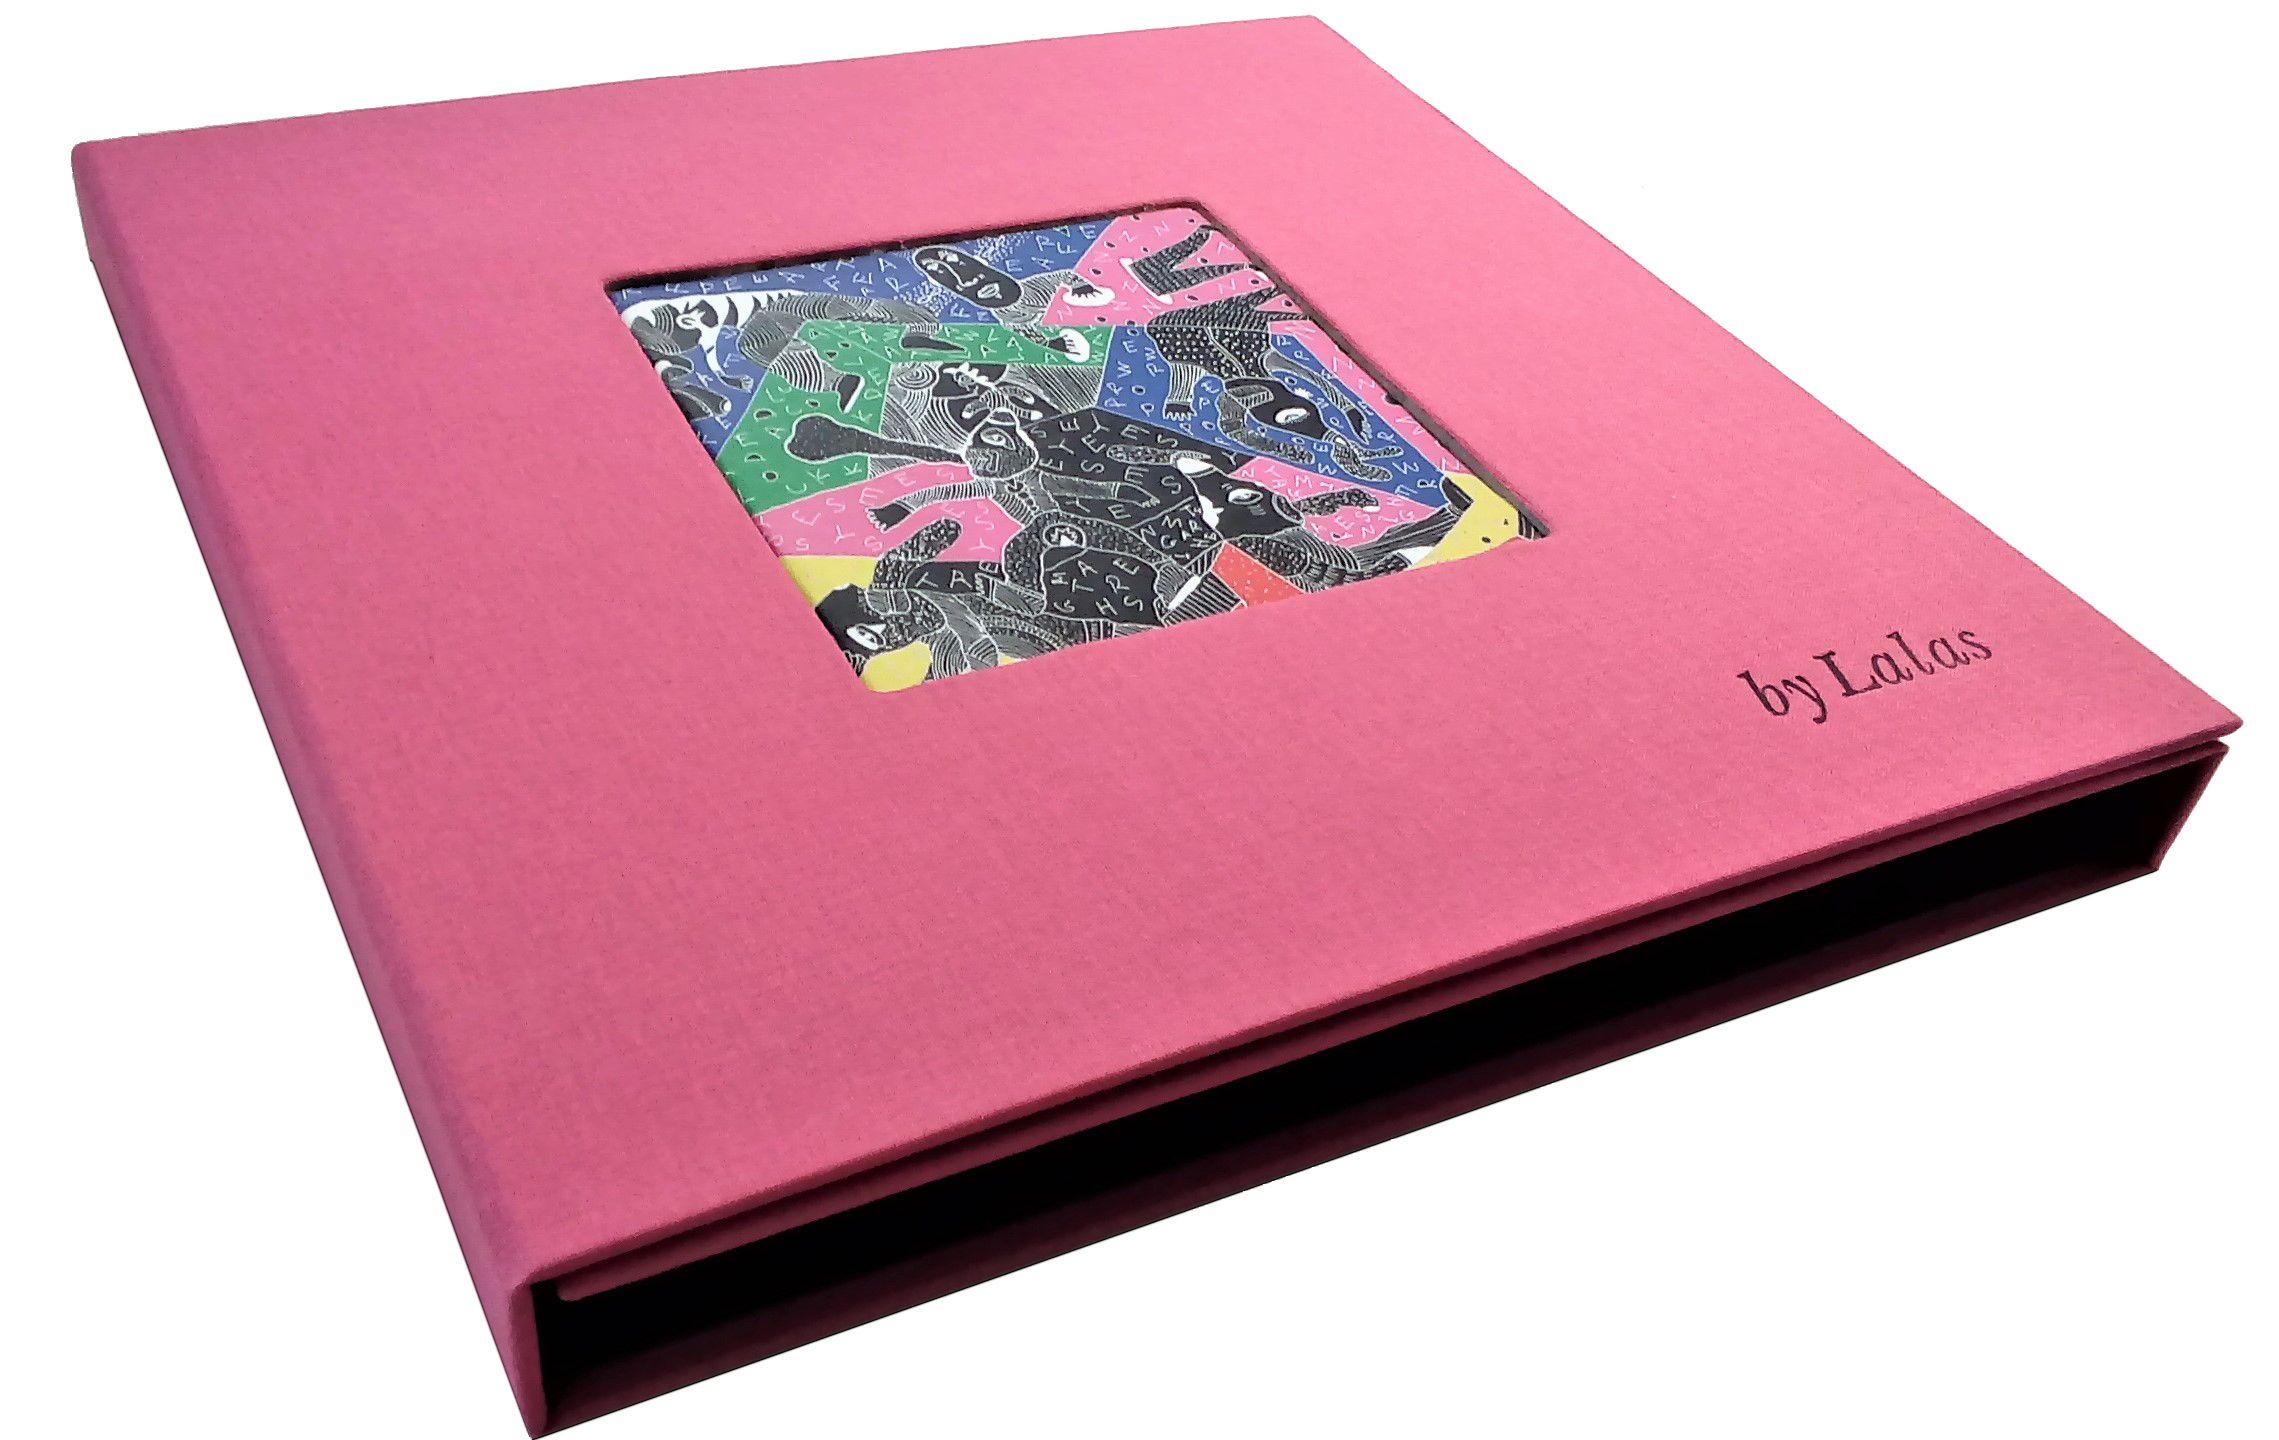 Box for digital art prints digital art prints prints